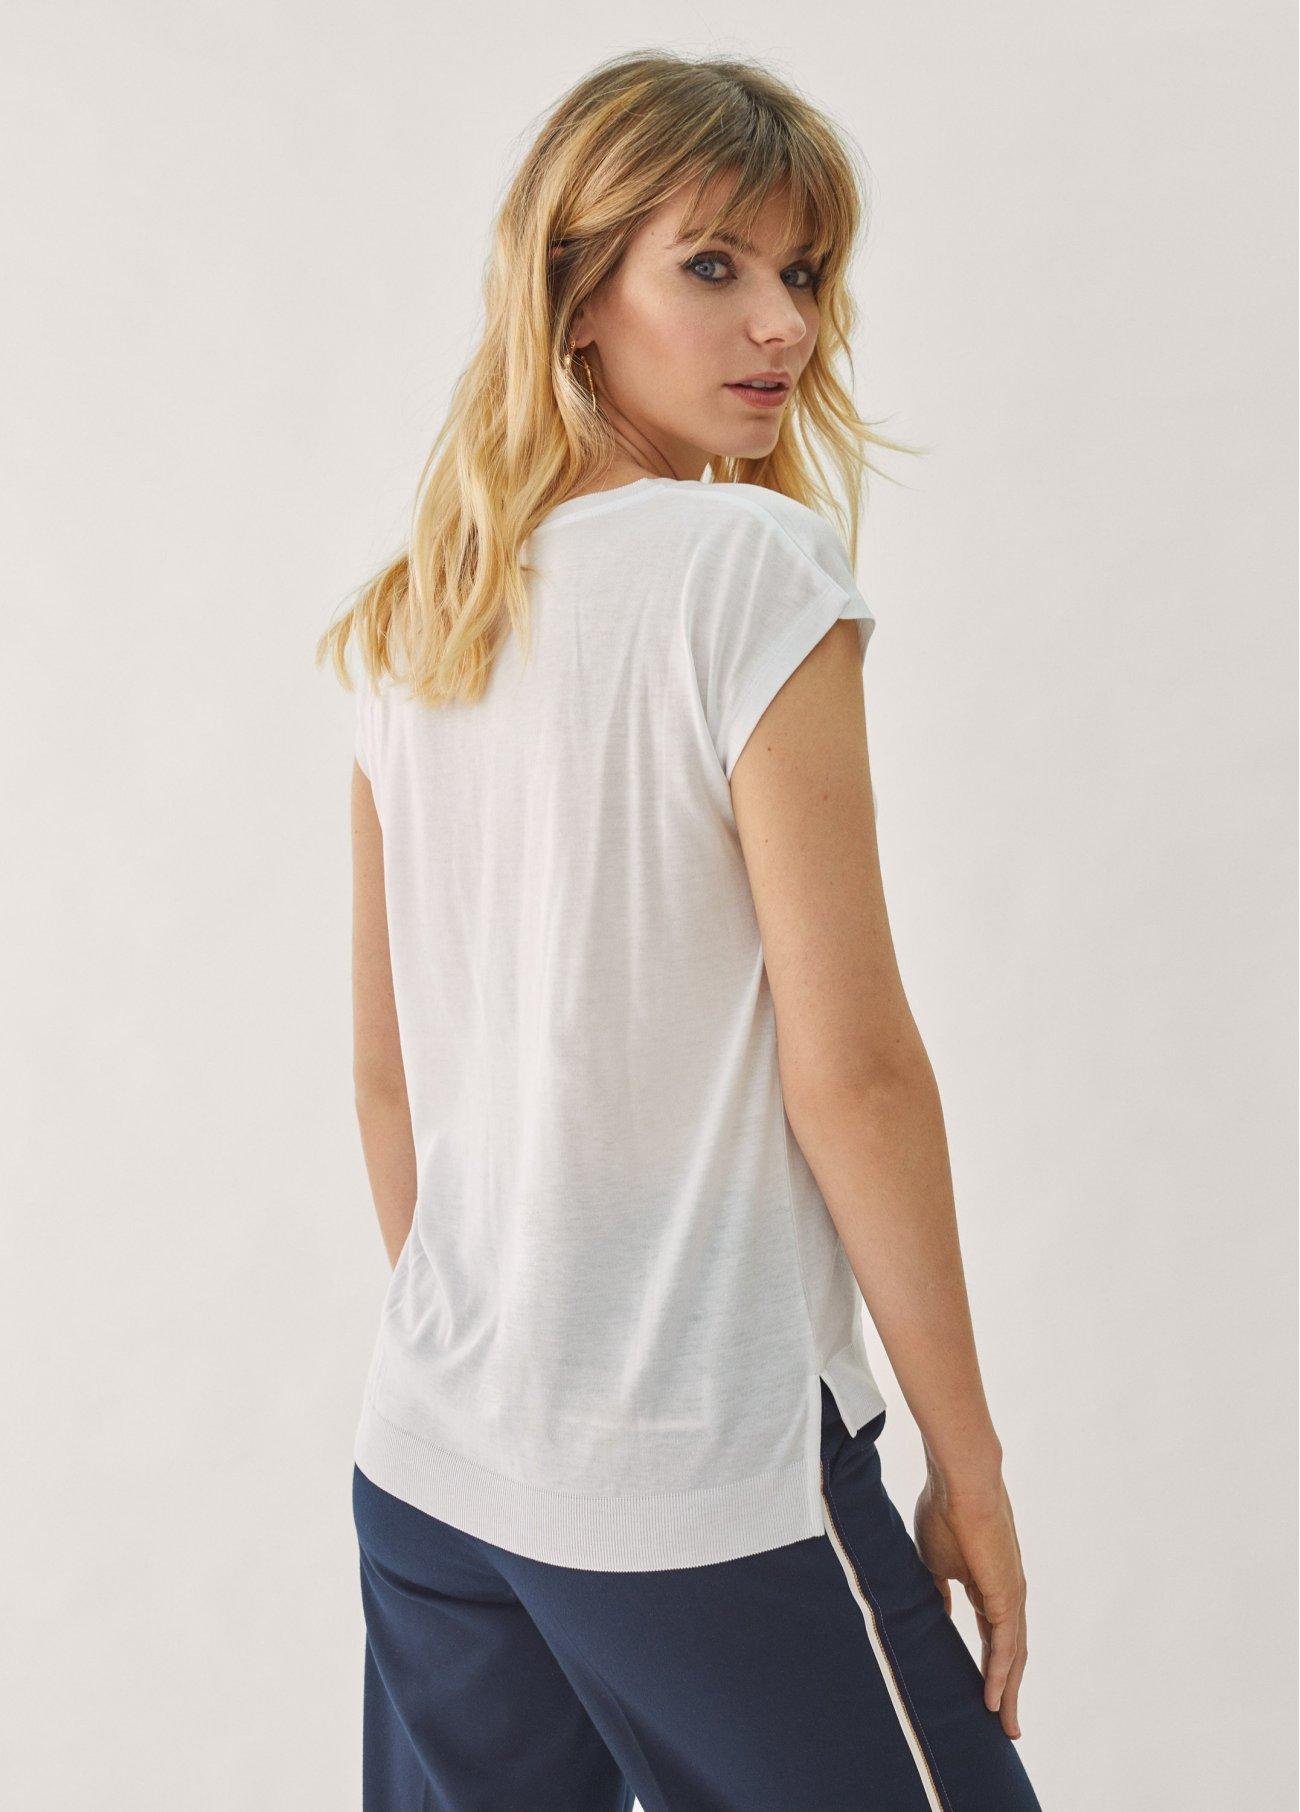 Camiseta básica V, marino, crudo 2